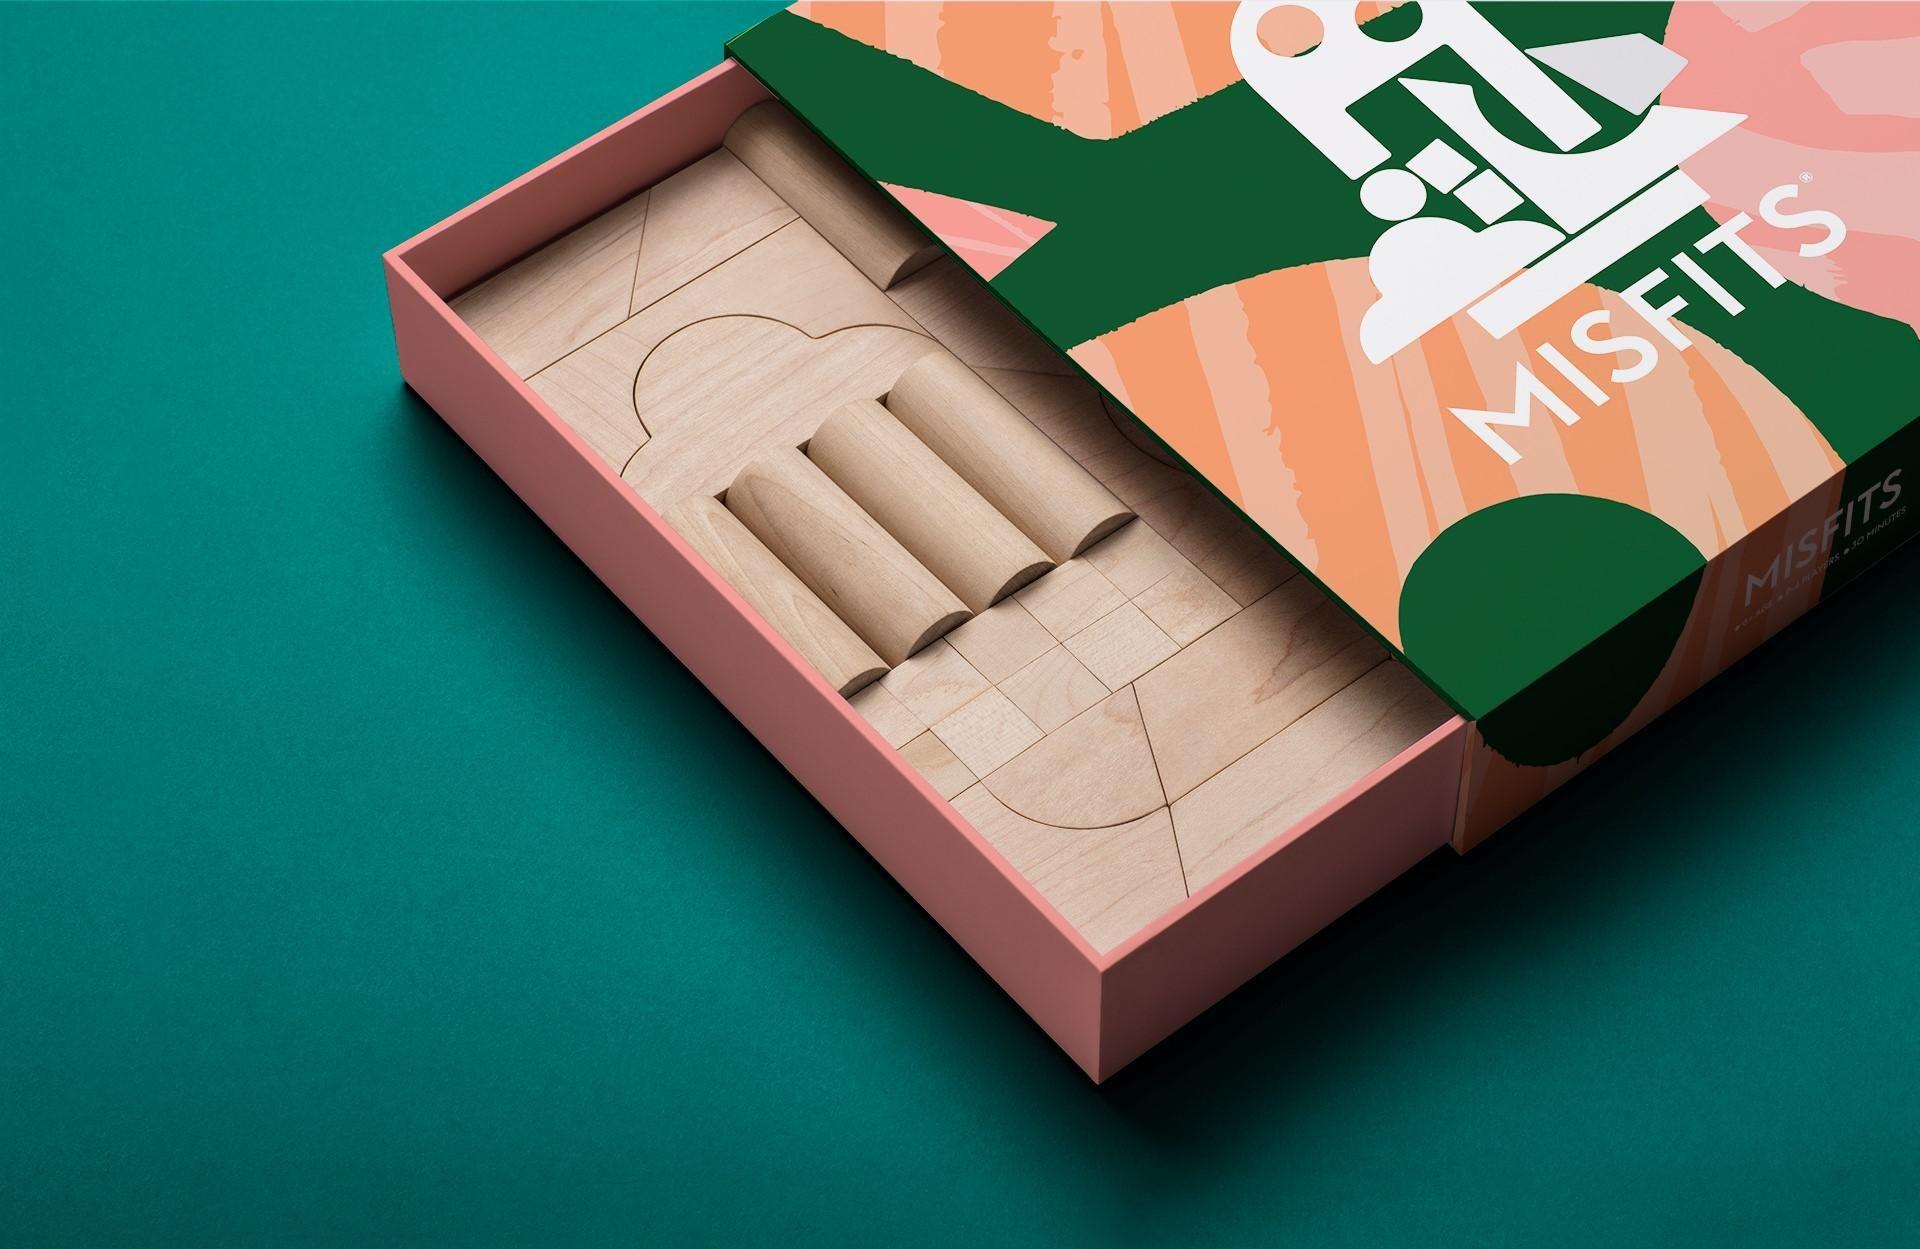 Misfits new packaging